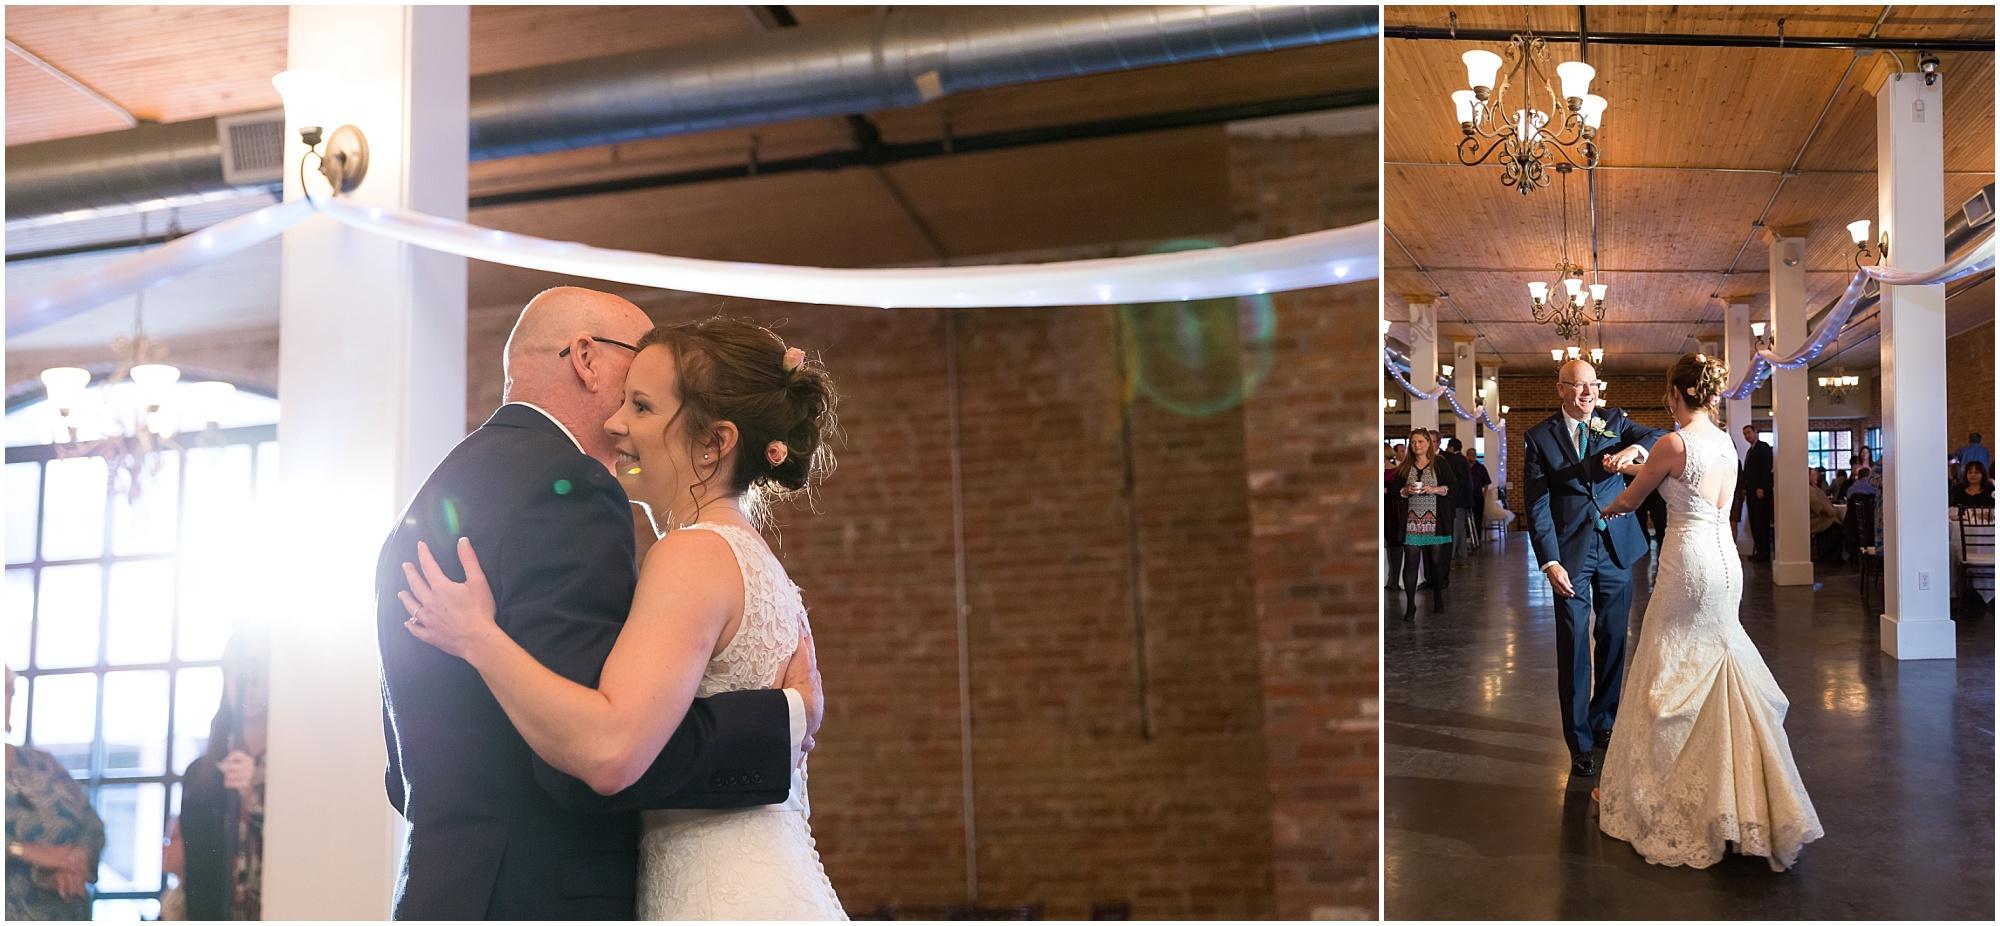 Downtown-Waco-Fall-Wedding_0029.jpg